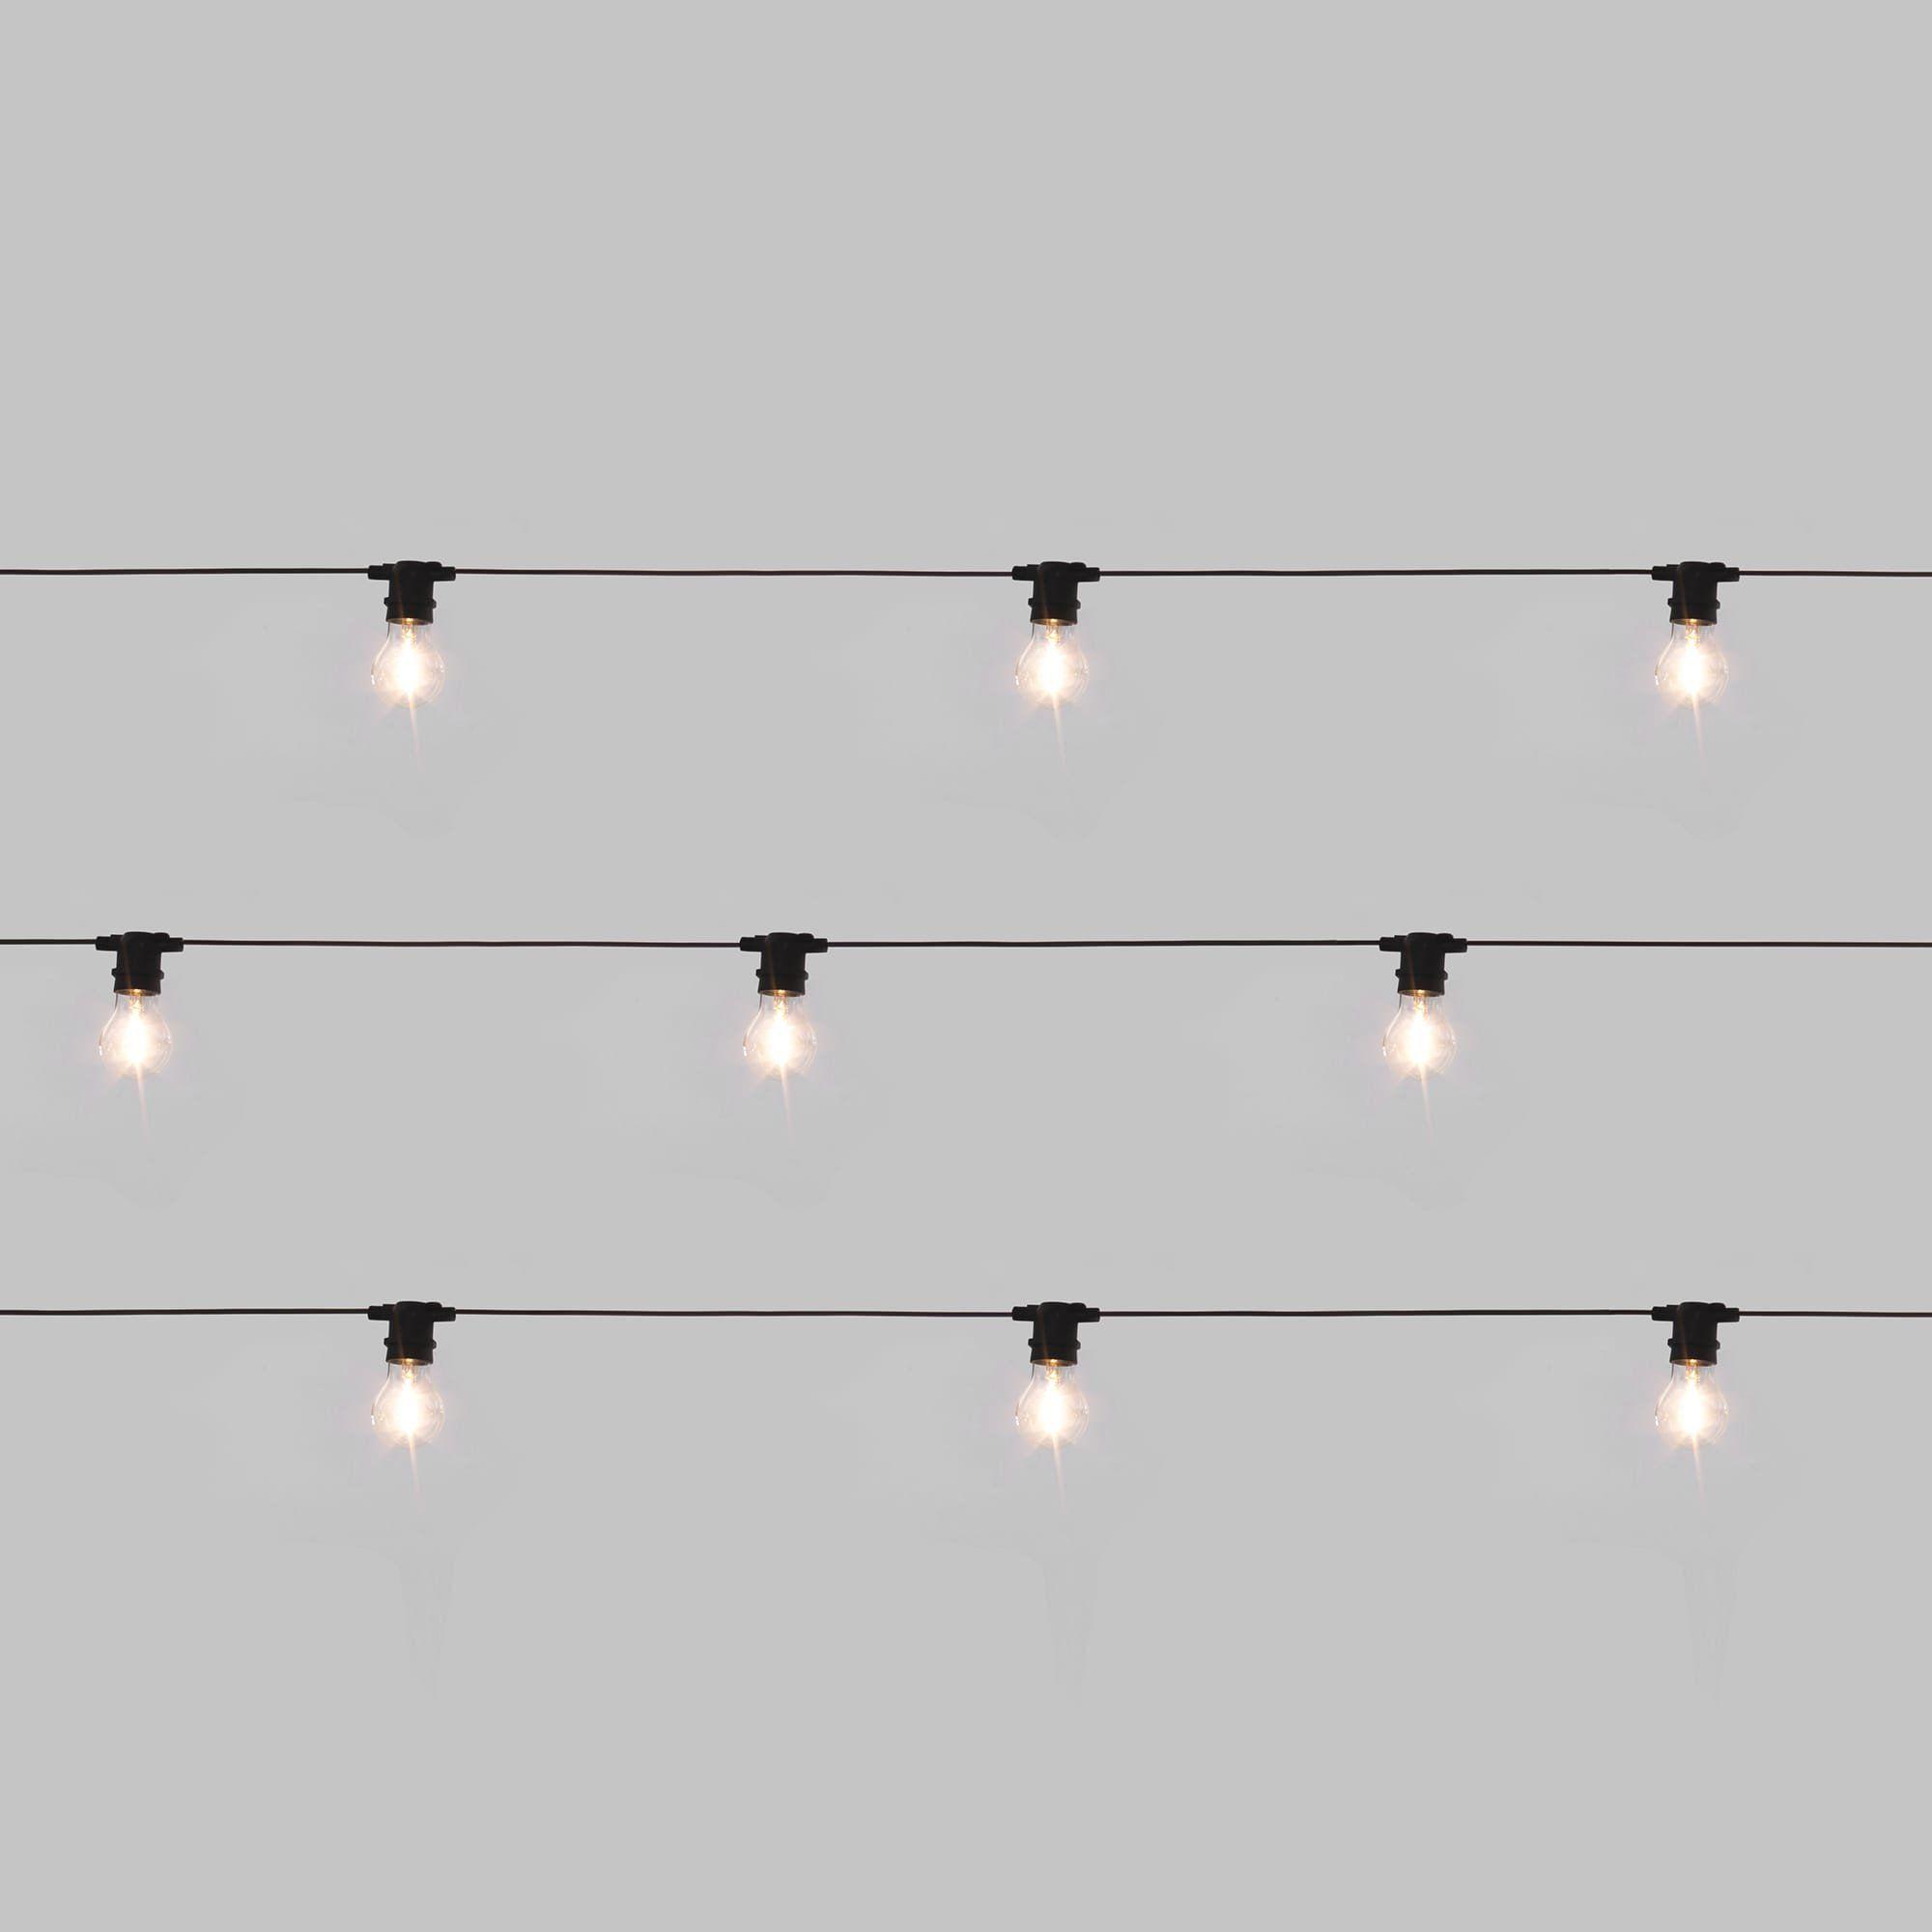 Bella Vista Set Of 10 Lights In Clear Design By Seletti Vista